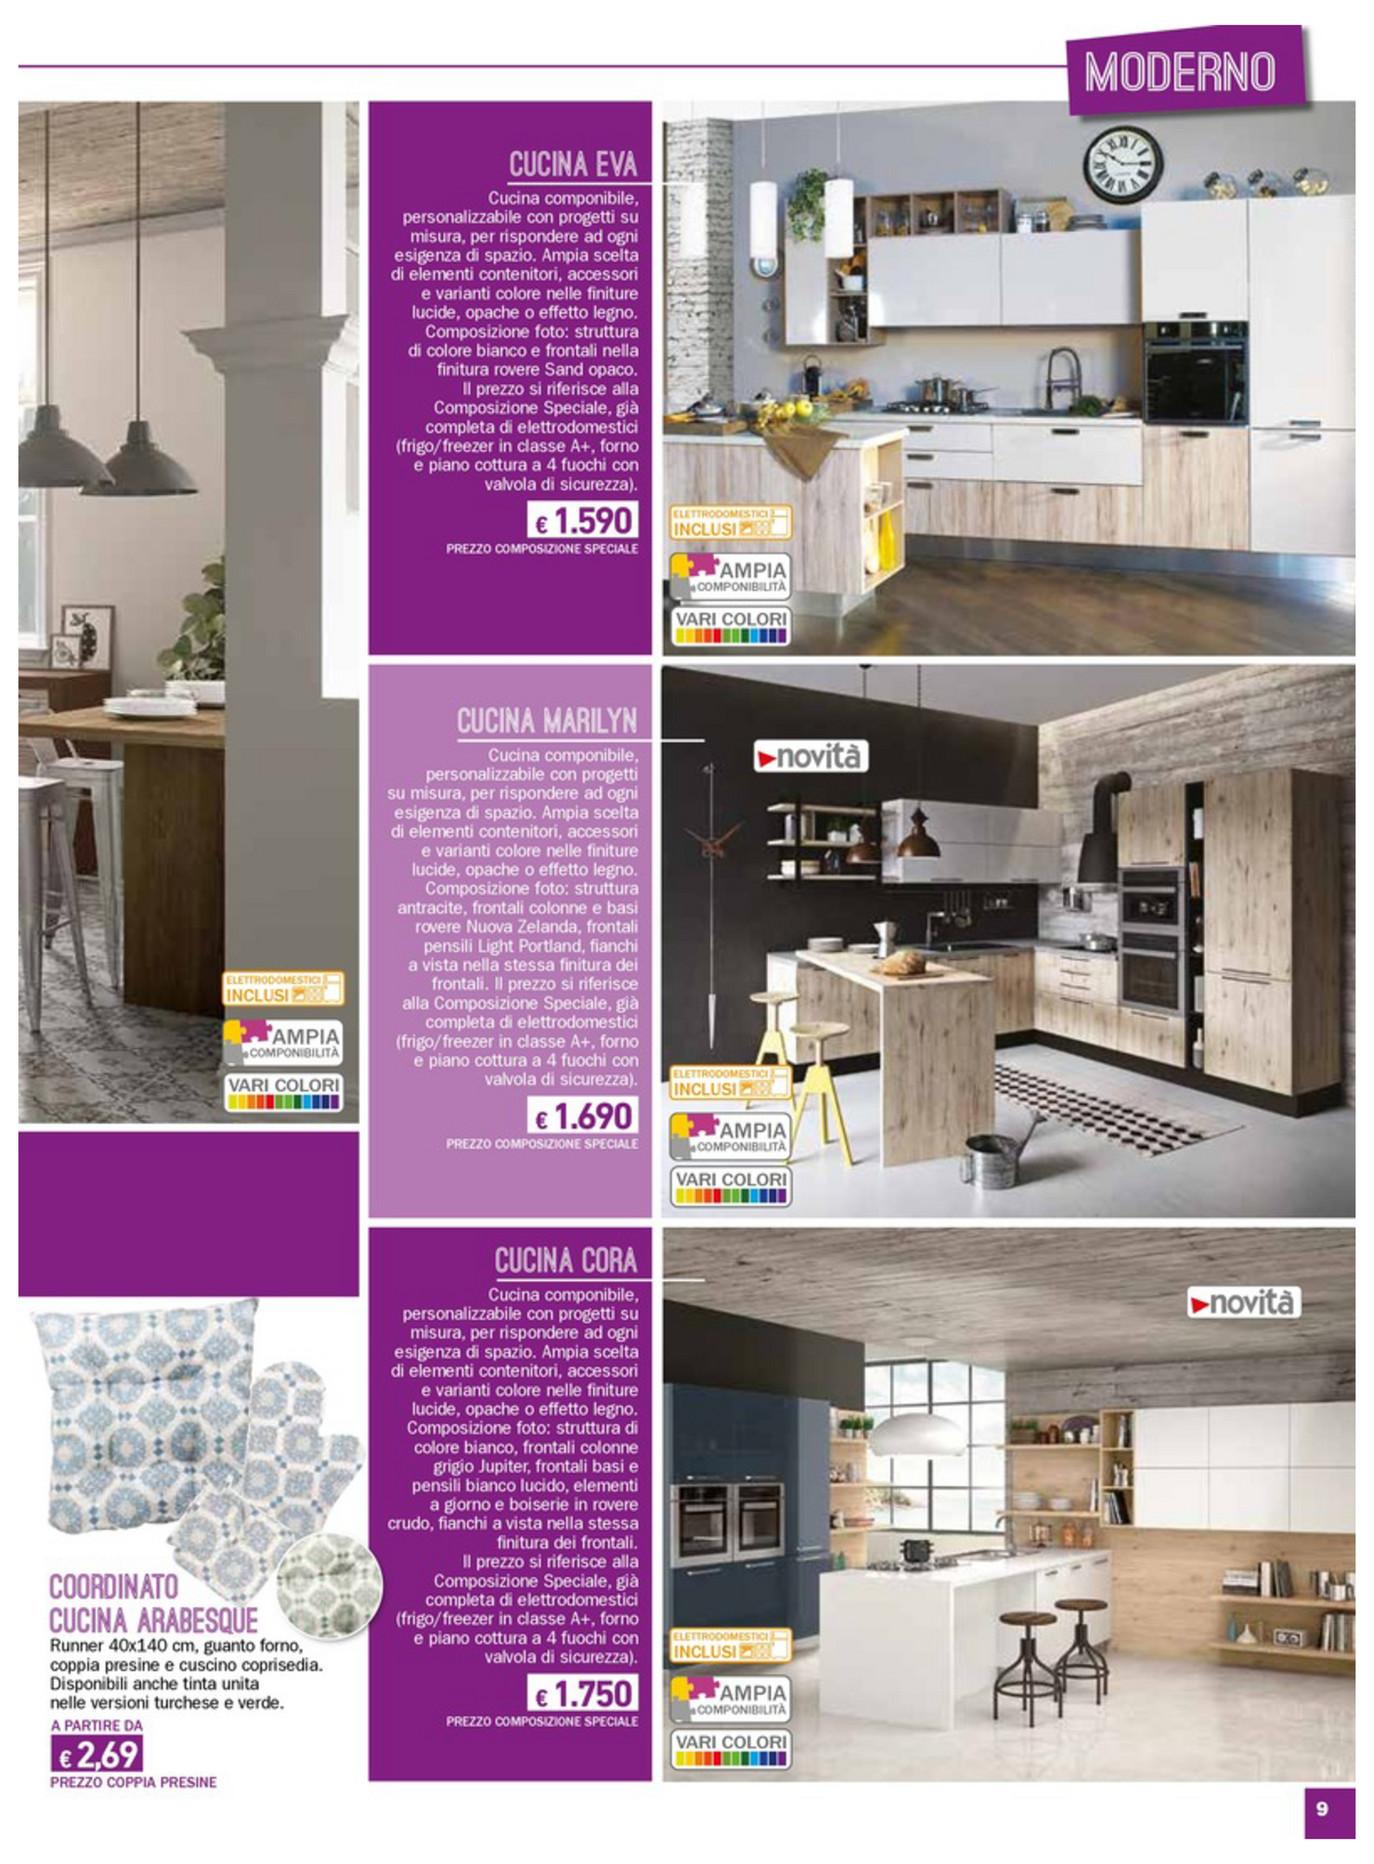 Stunning Cucina Componibile Mercatone Uno Gallery - Ameripest.us ...